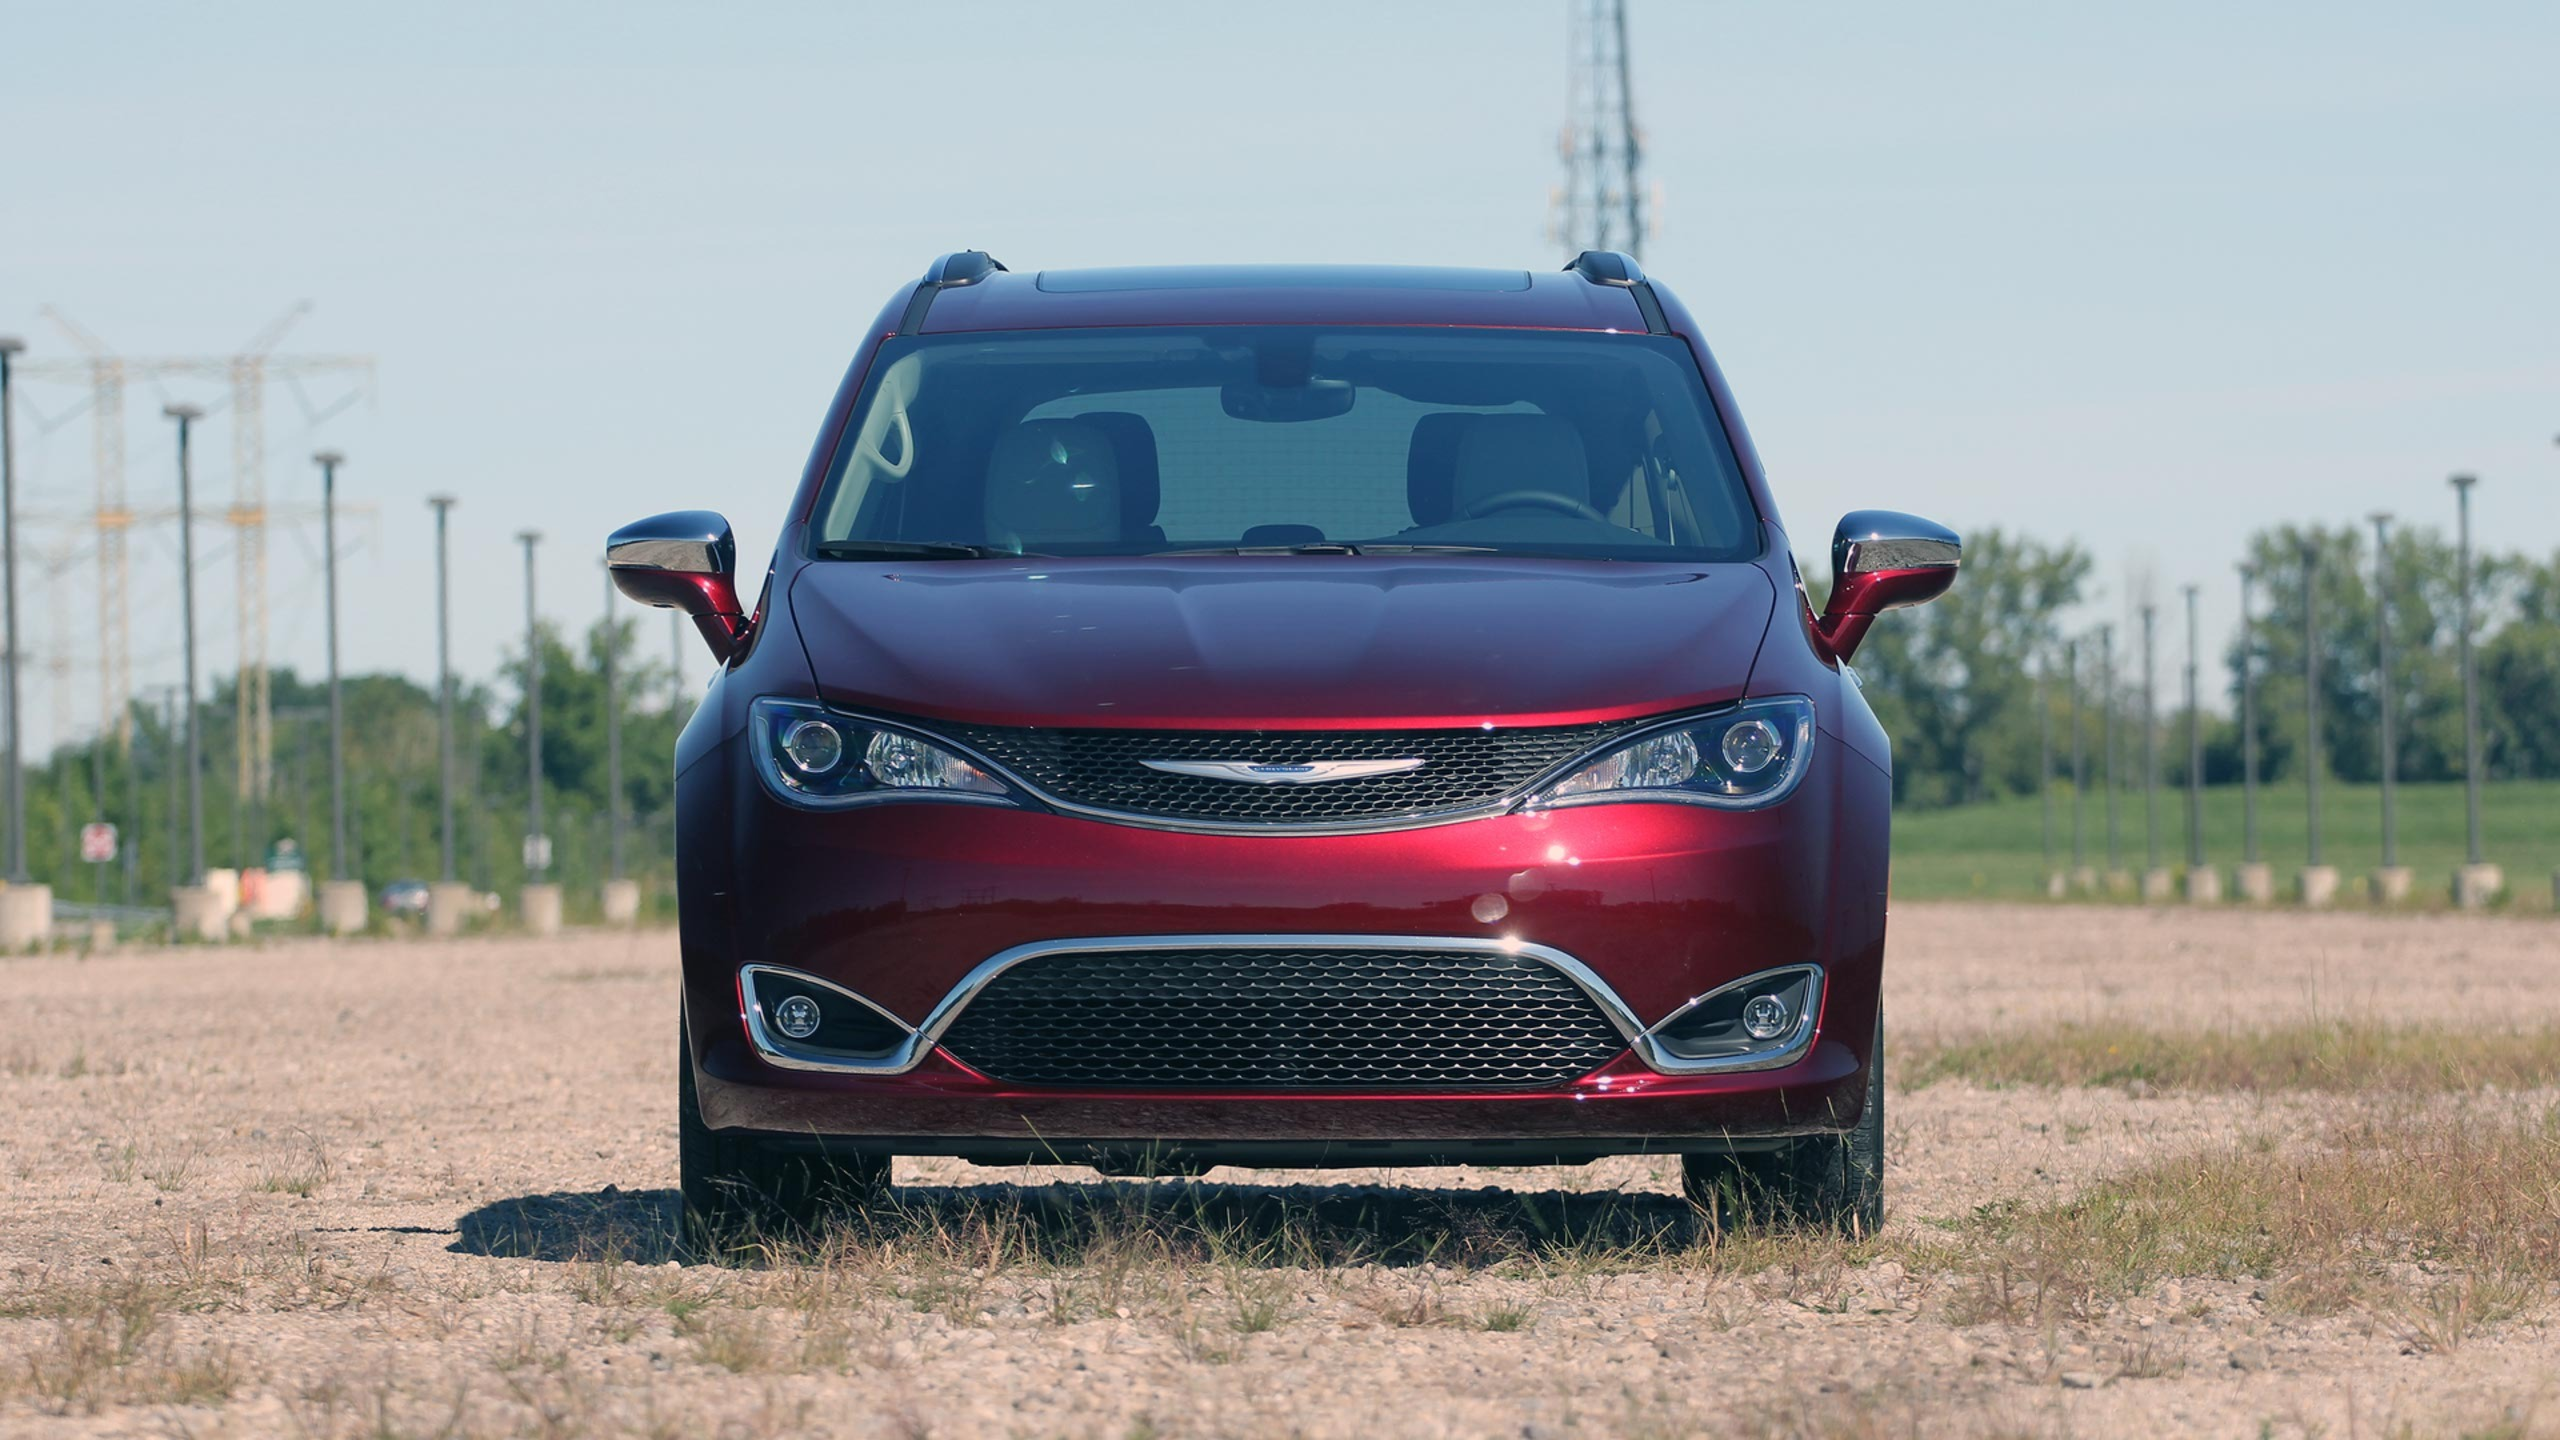 Chrysler Recalls 154 000 Pacifica Minivans For Stalling Issue